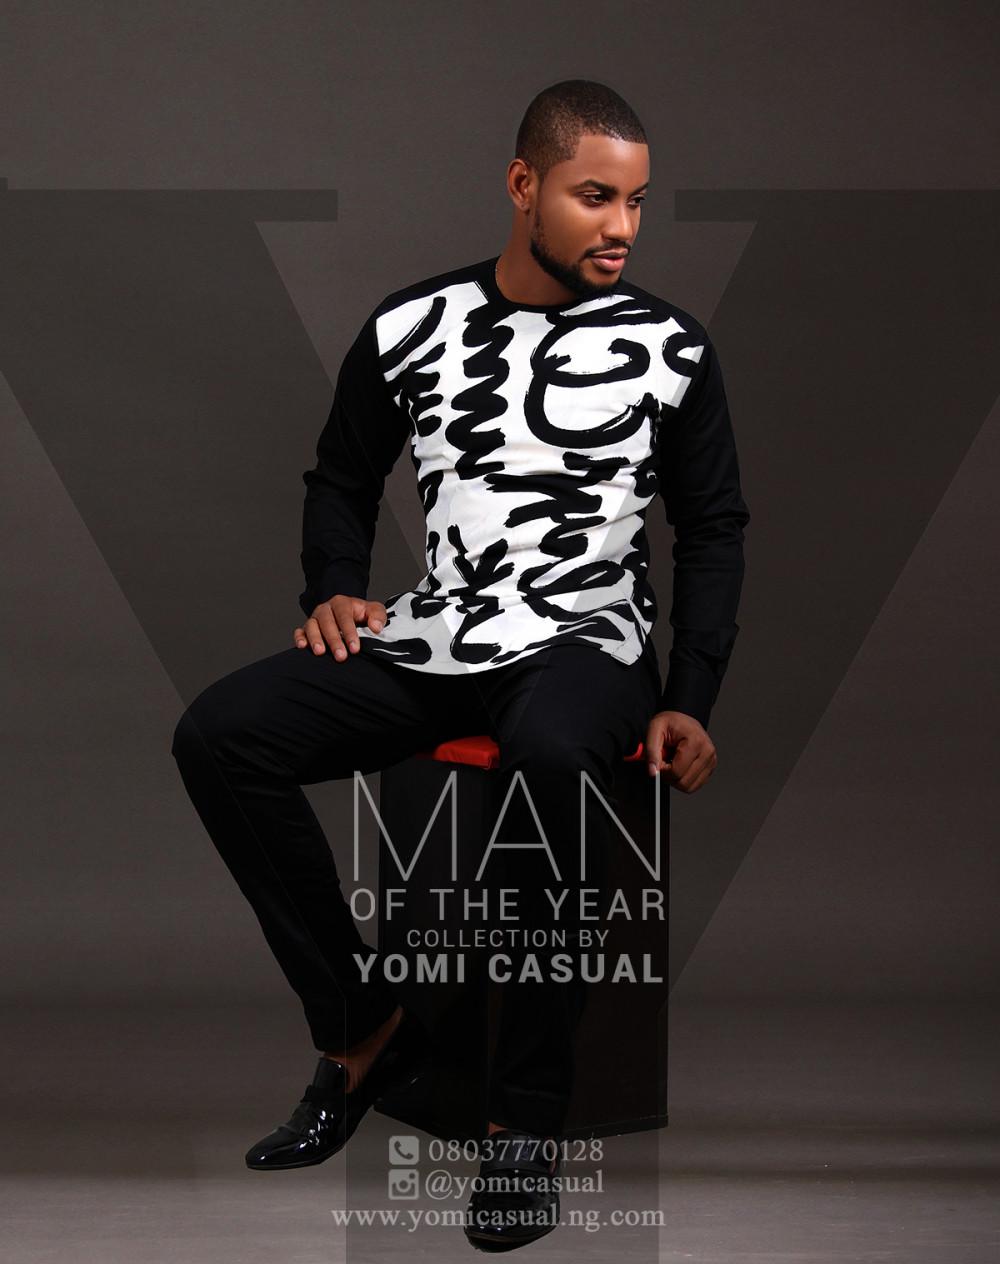 Yomi Casuals Man of the Year Collection Lookbook - BellaNaija - December2015 (3)